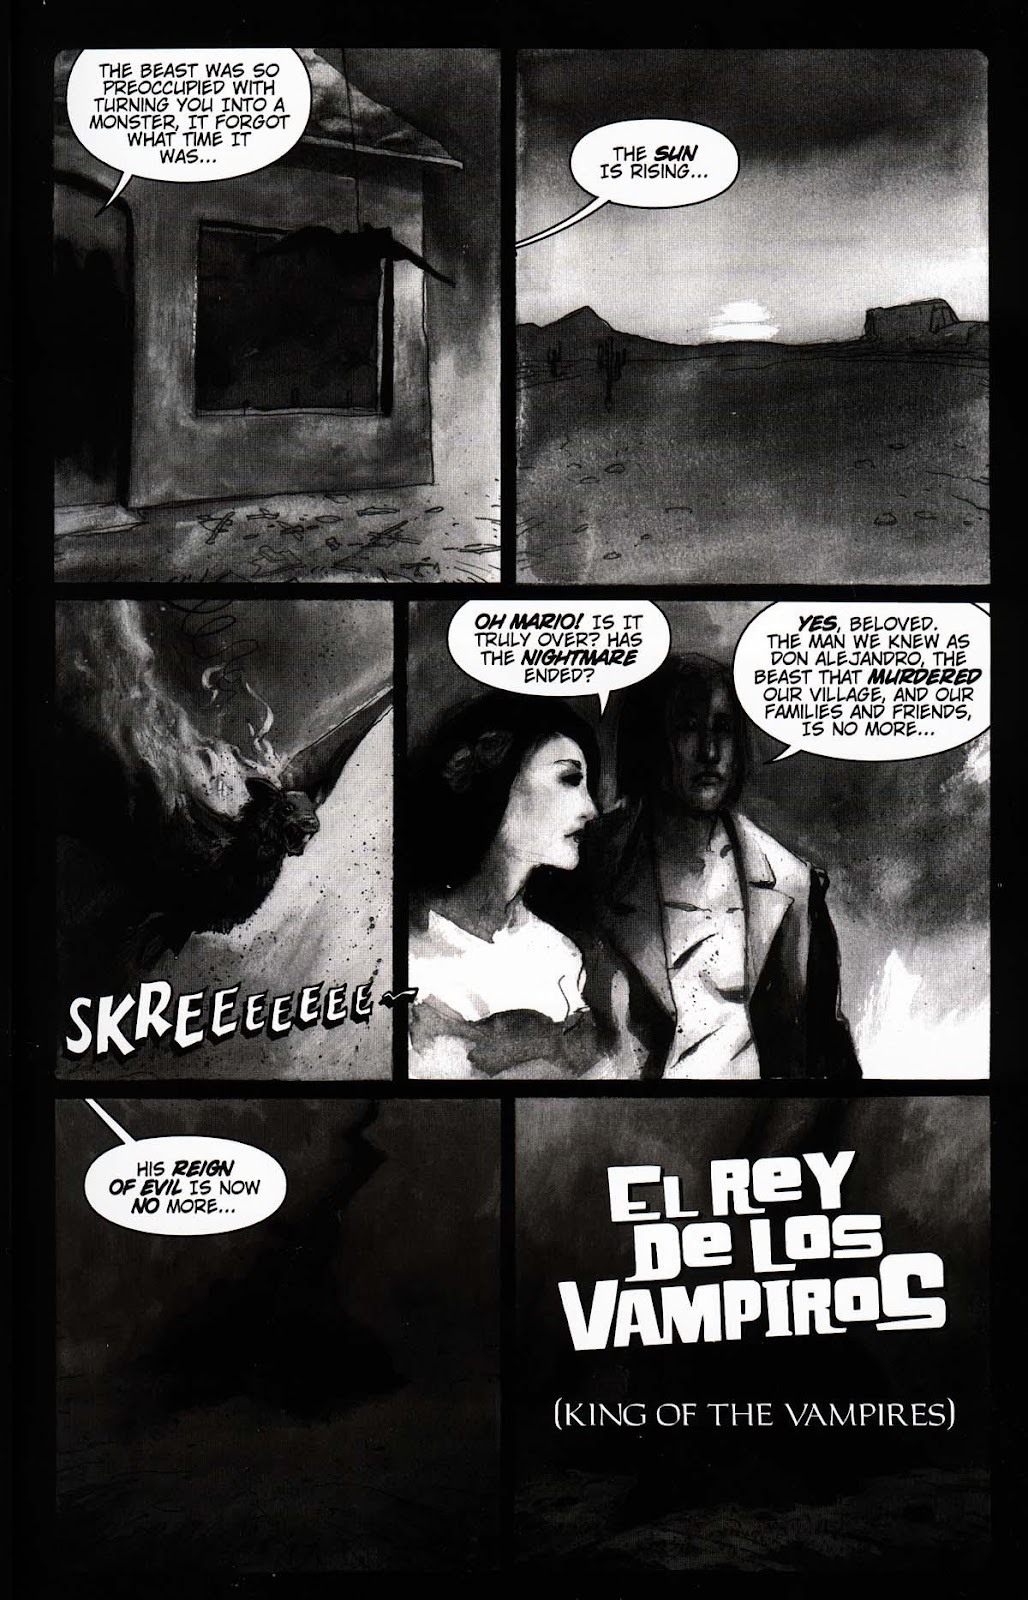 Read online Vampire the Masquerade comic -  Issue # Toreador - 9